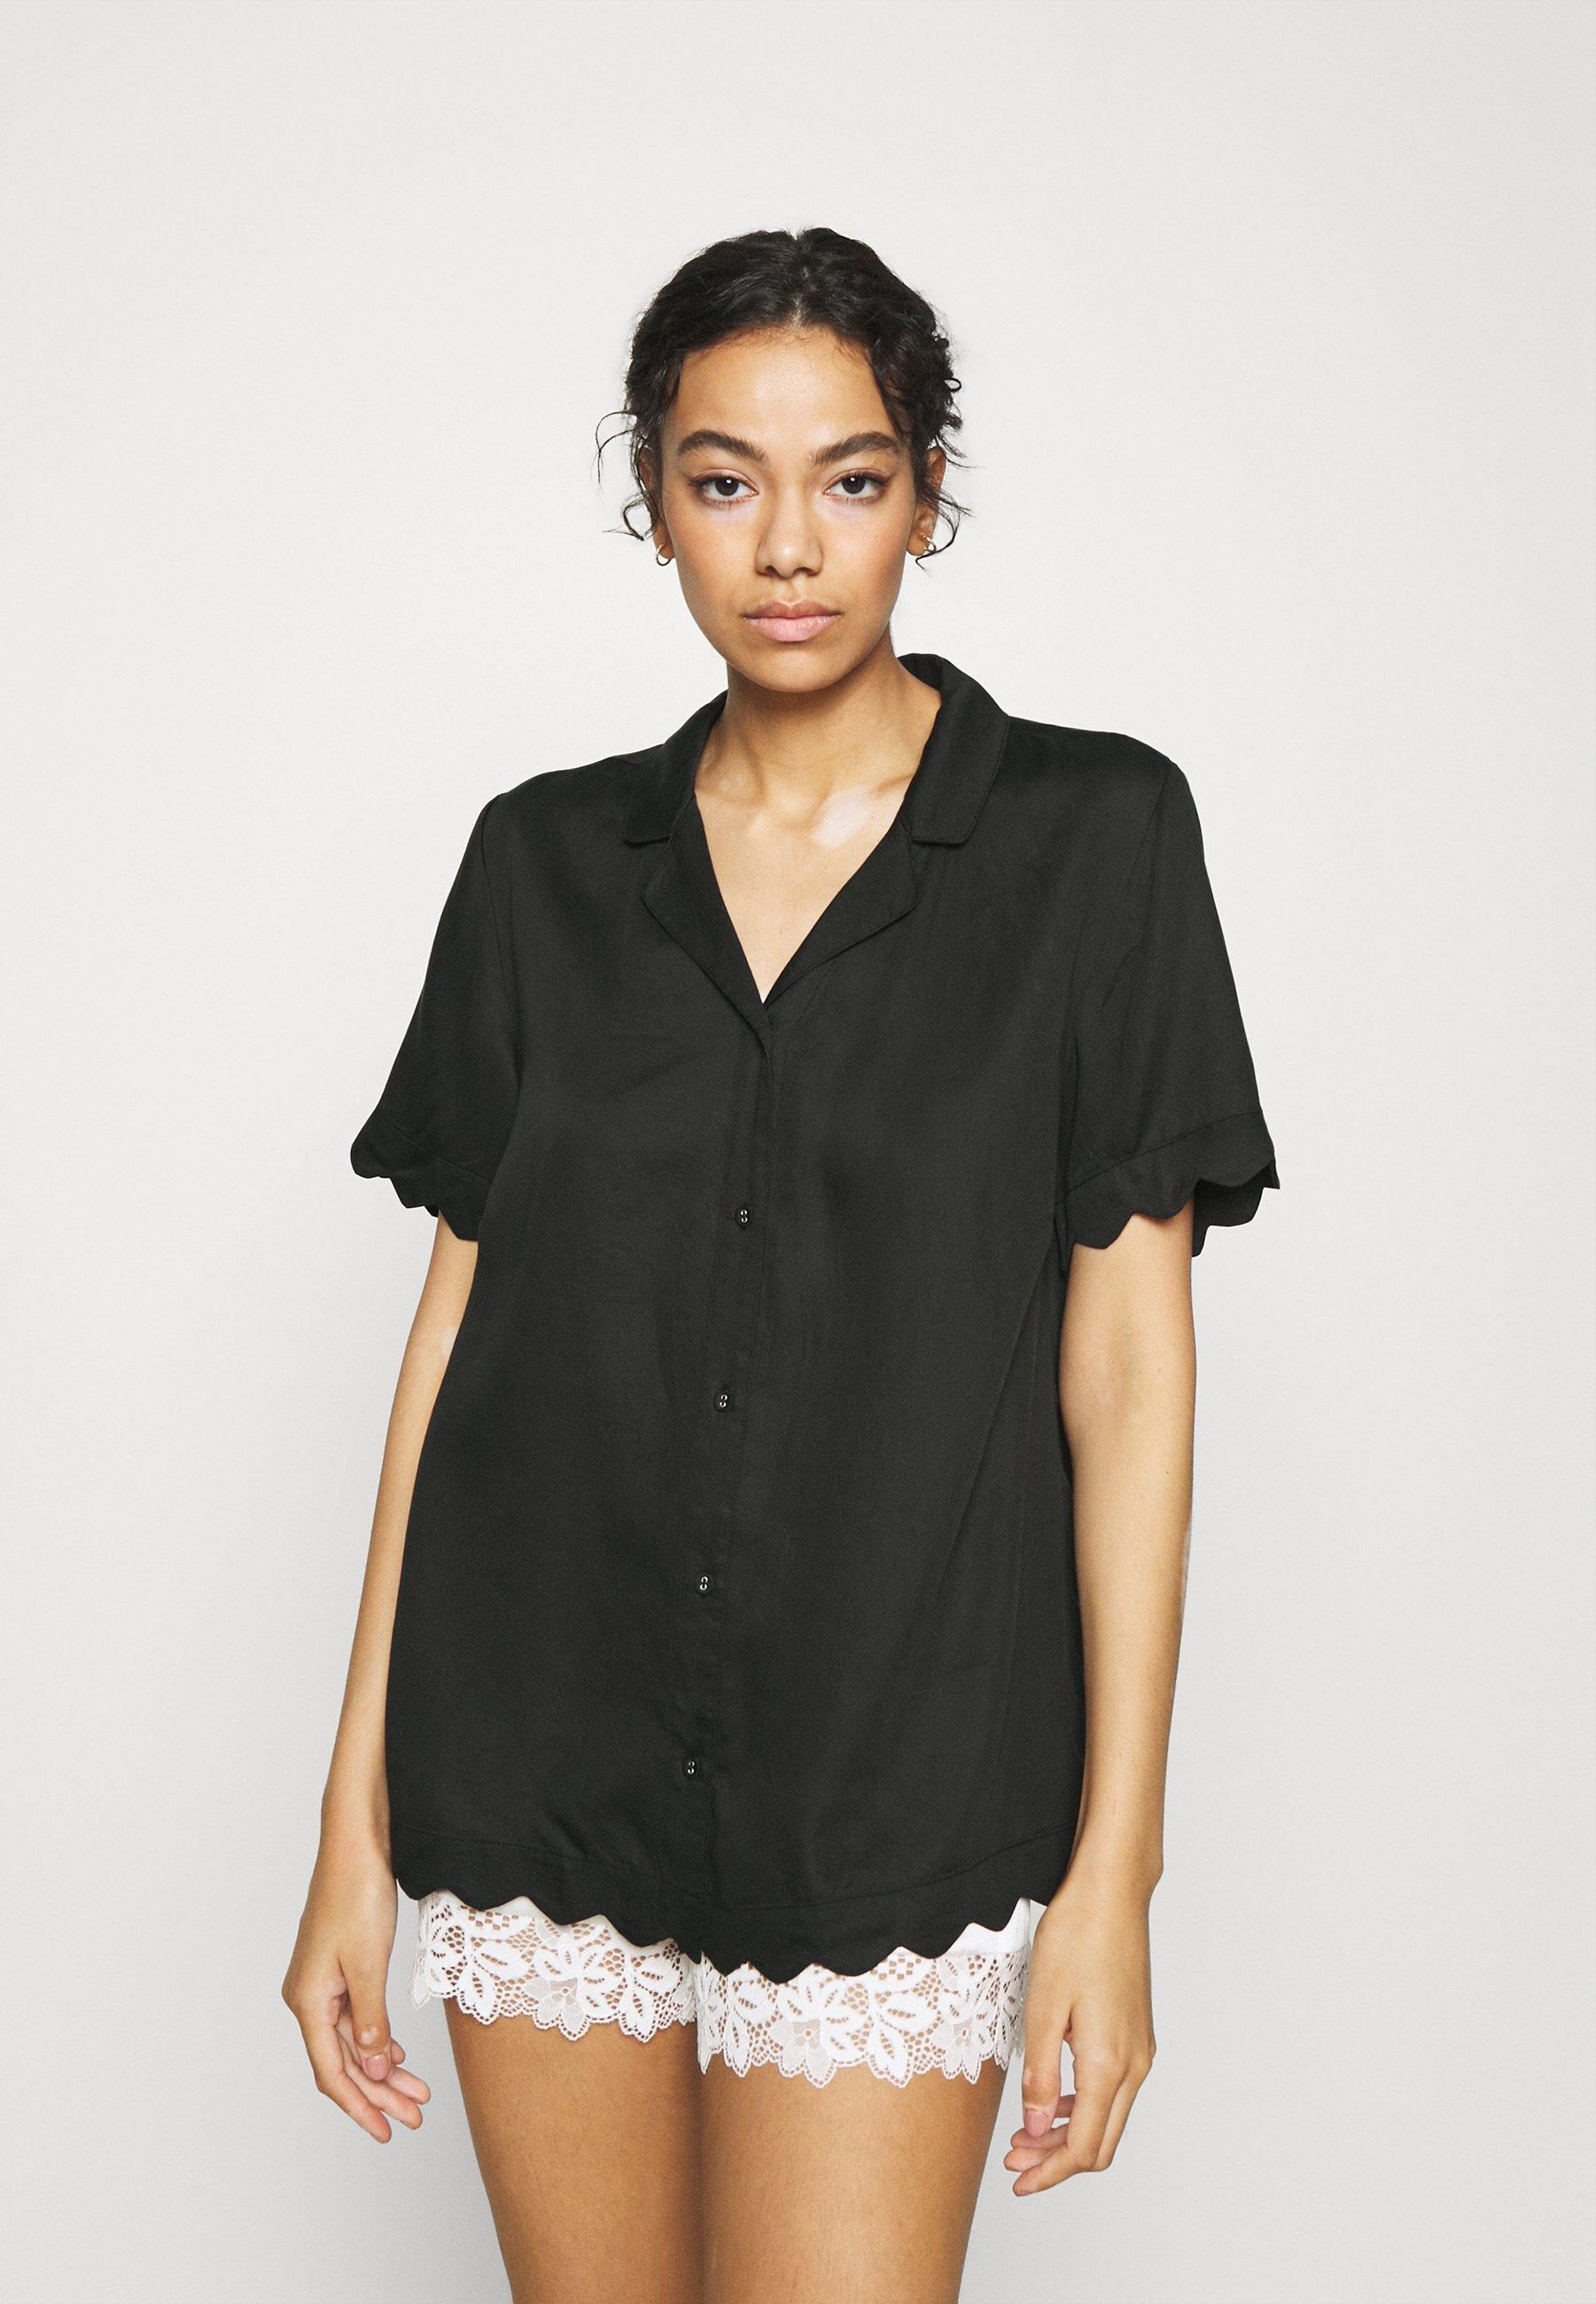 Donna JANE SHORT SHIRT - Maglia del pigiama